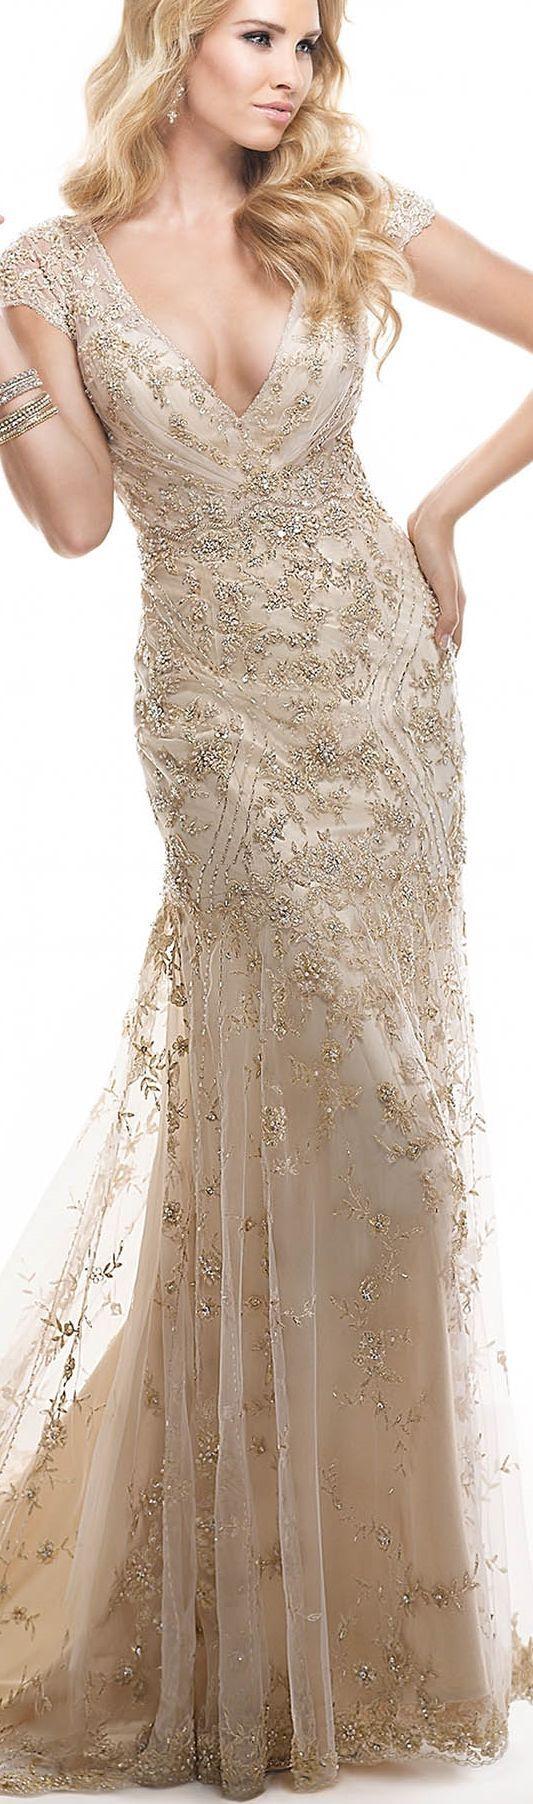 ~Latest Luxurious Women's Fashion - Haute Couture - dresses, jackets. bags, jewellery, shoes etc ~ DK